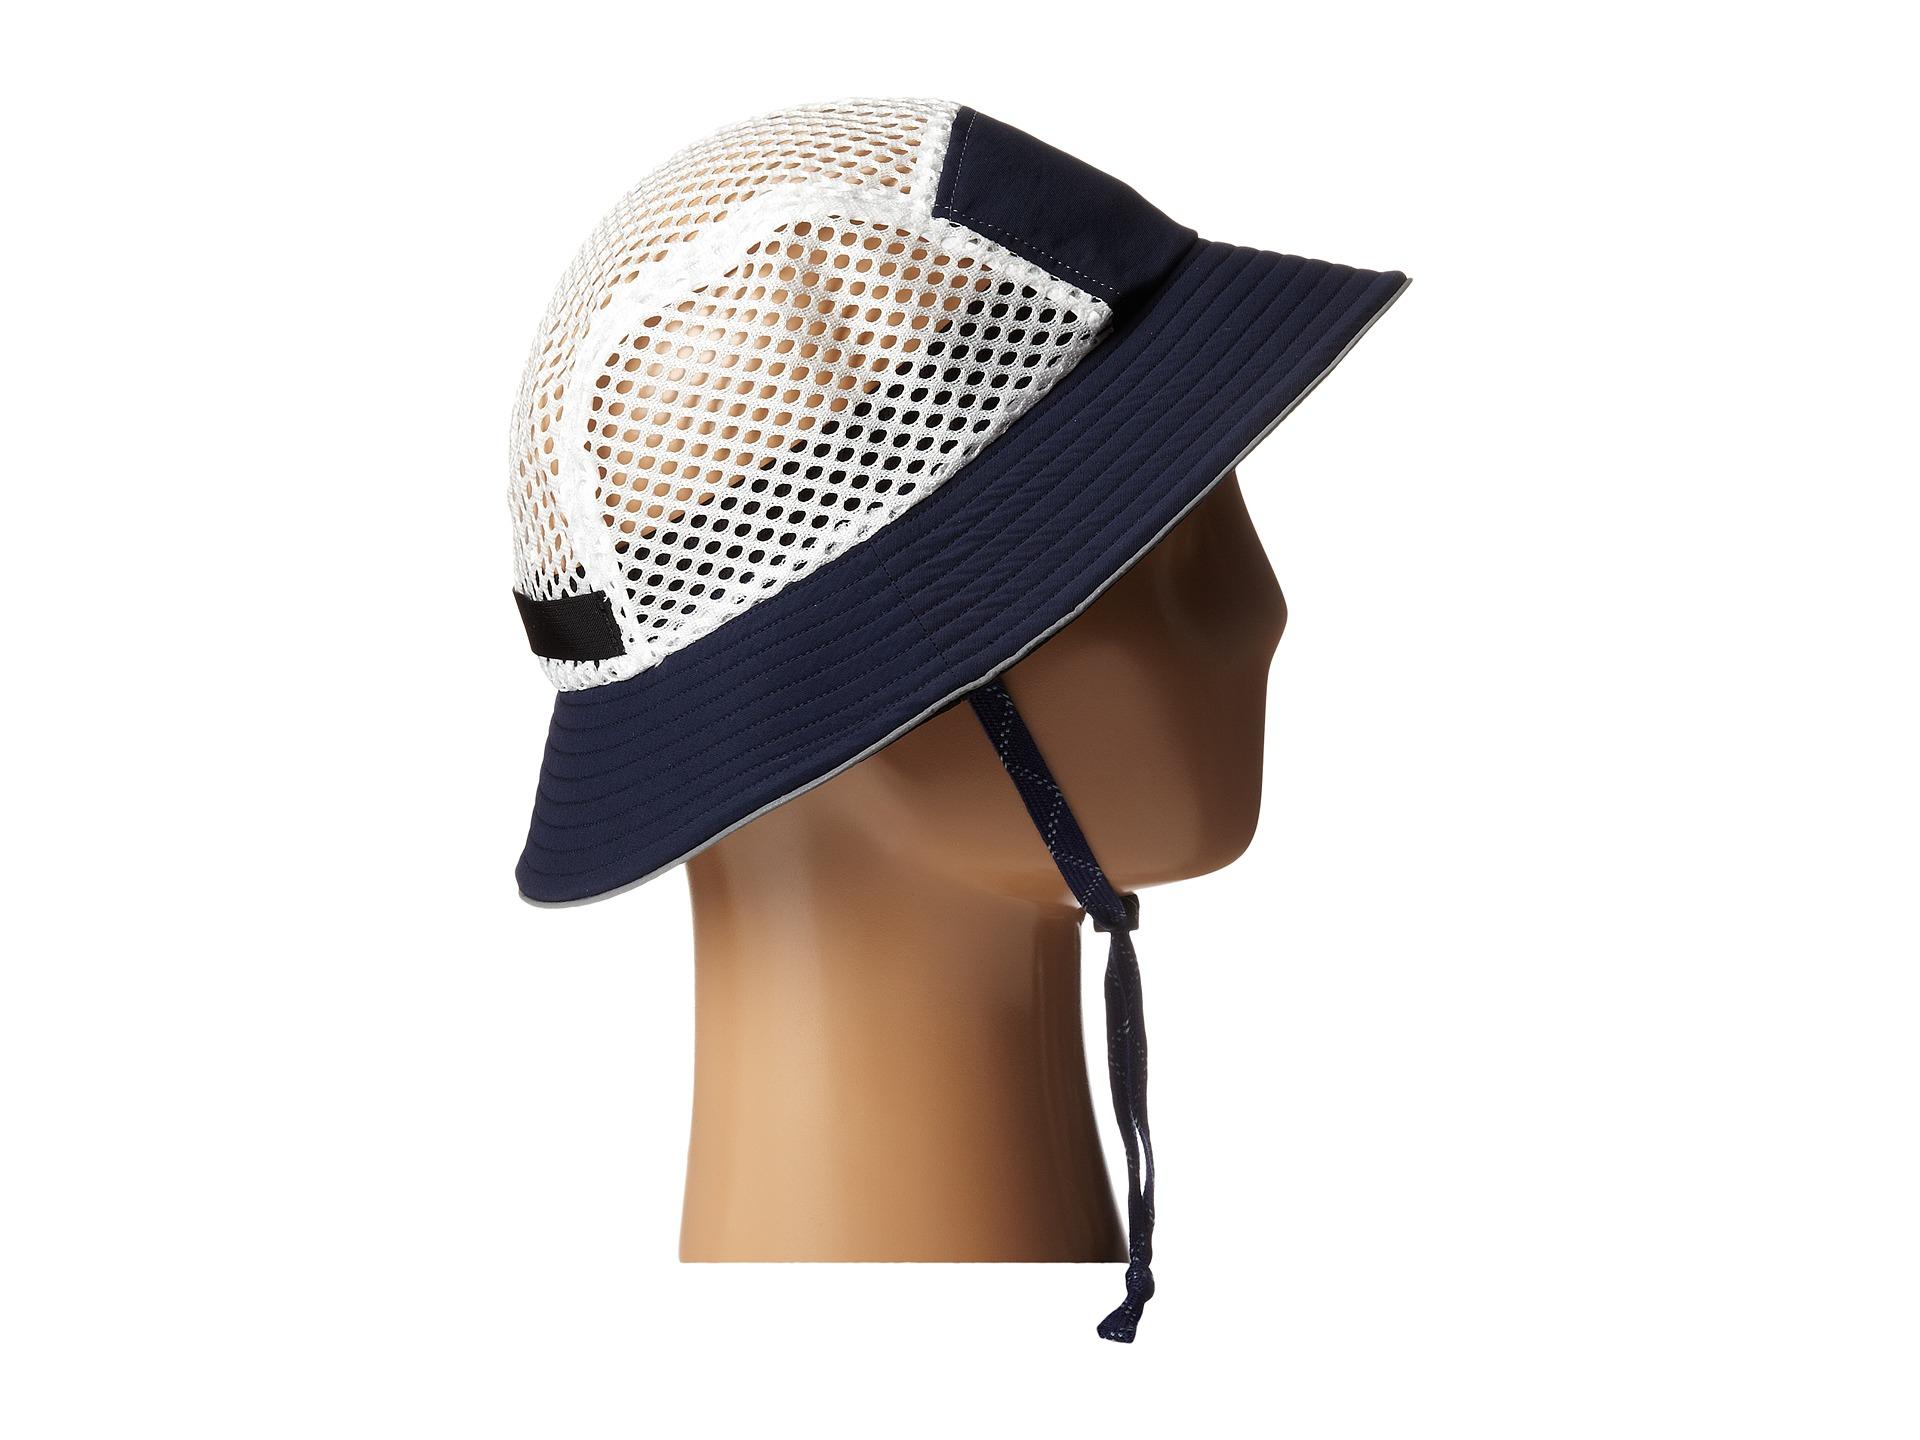 Lyst - Patagonia Duckbill Bucket Hat in Blue 379aa820964